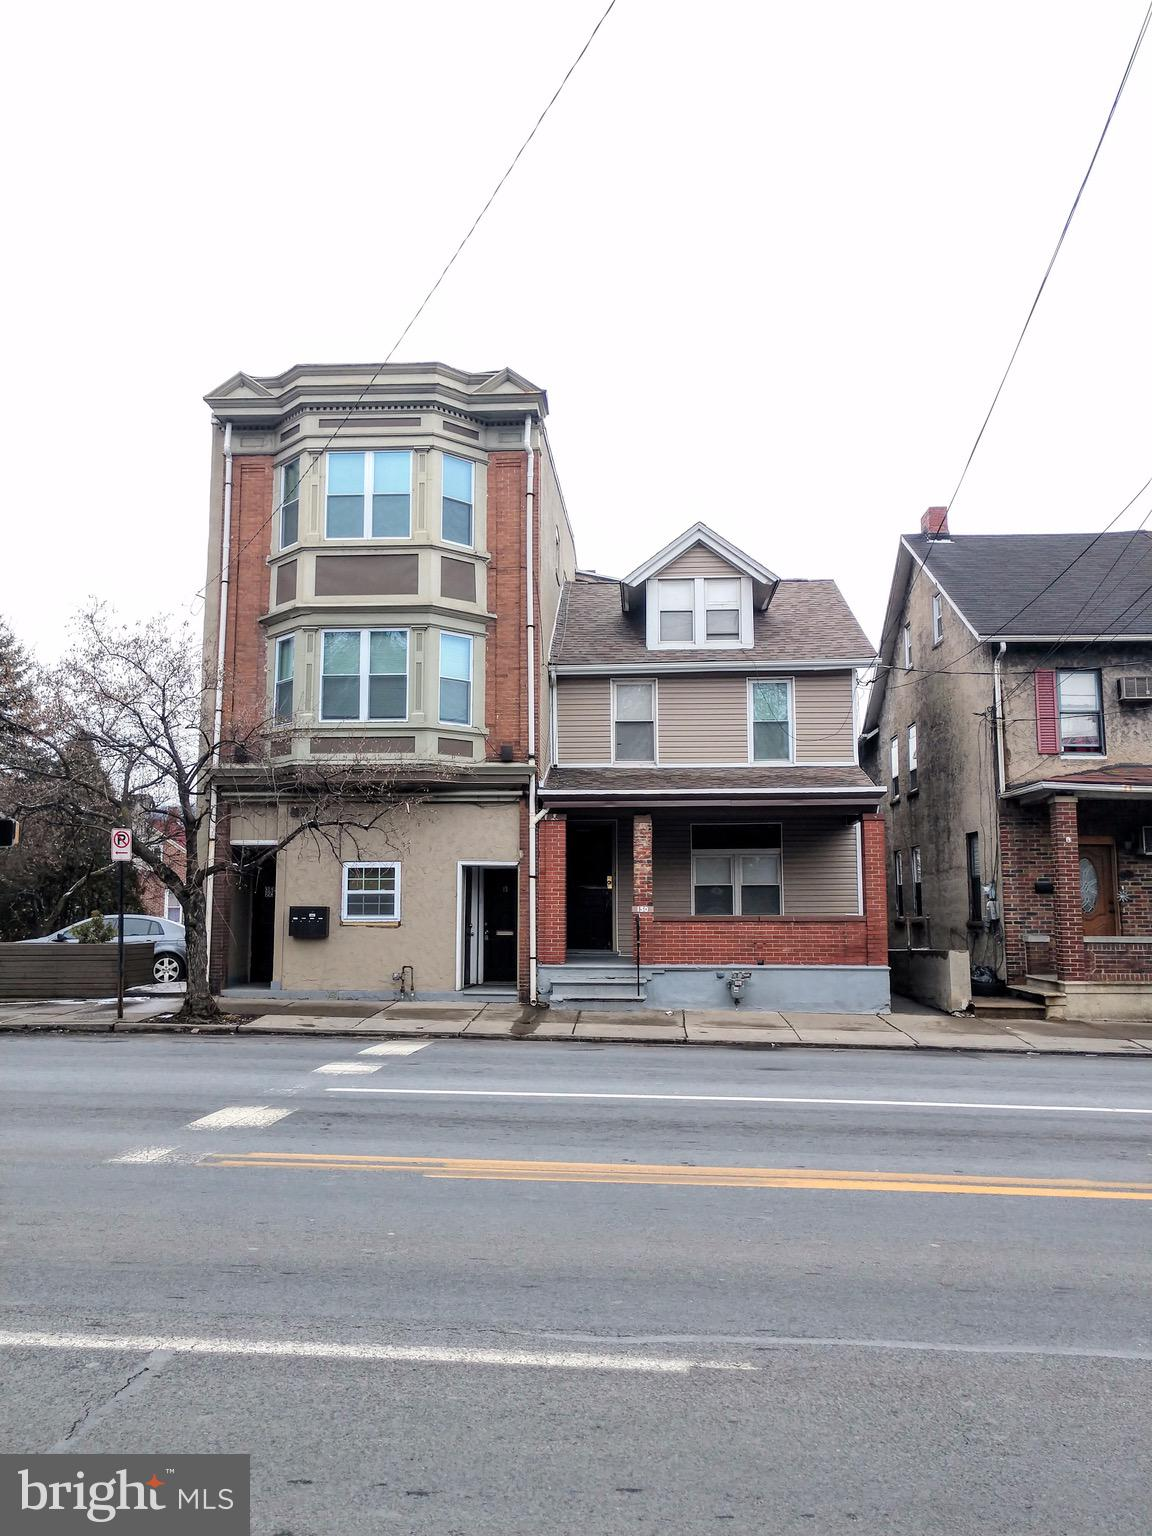 152 B HAMILTON STREET E, ALLENTOWN, PA 18109